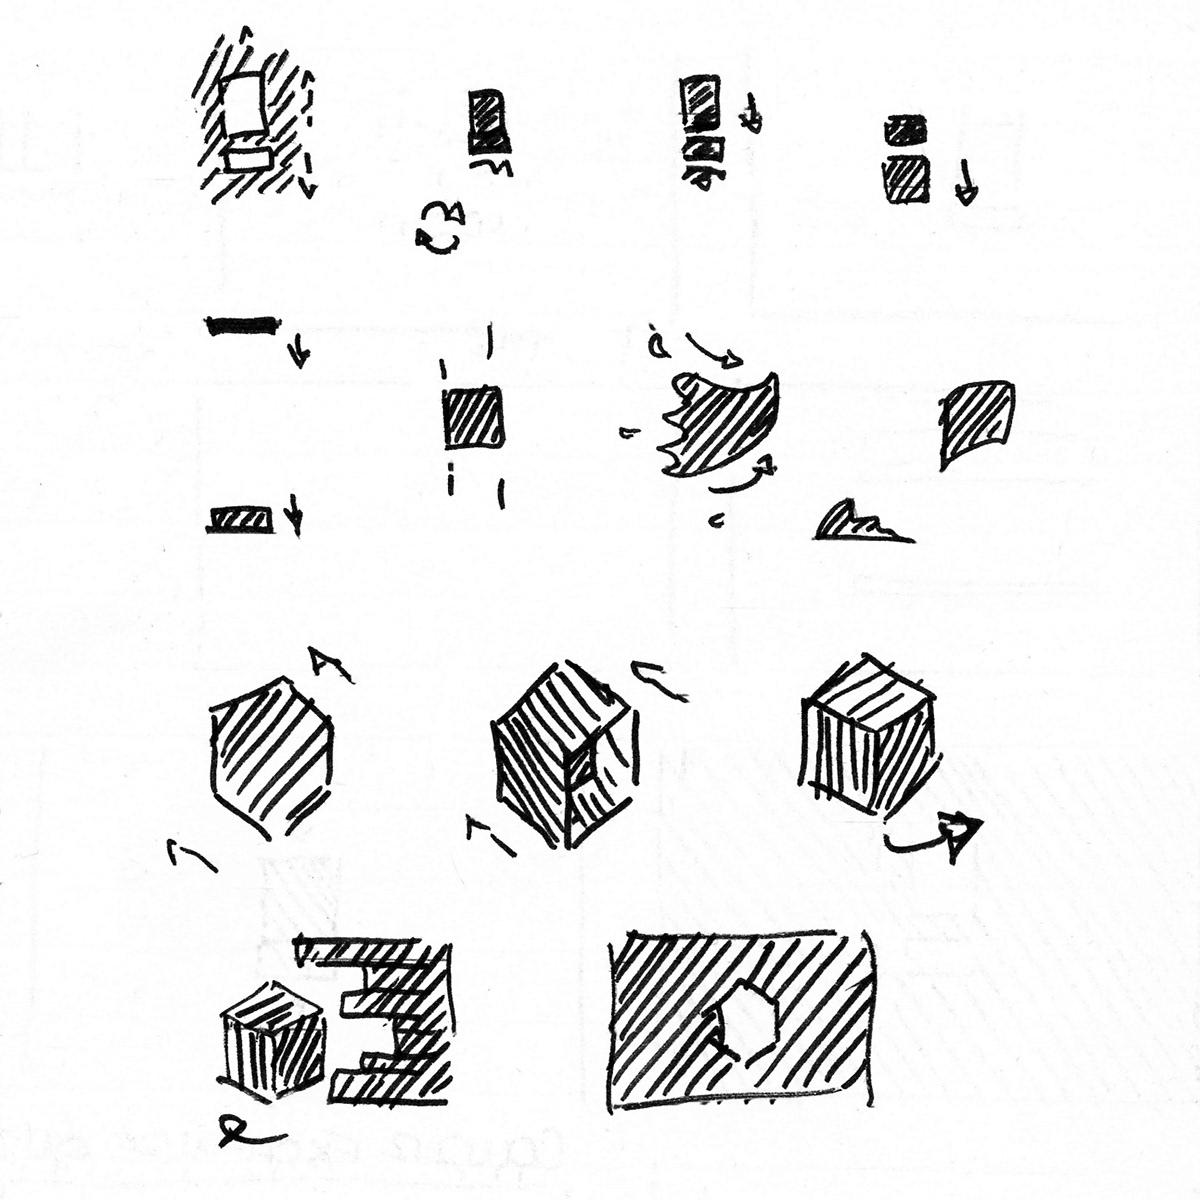 motion,MoGraph,challenge,adobe,boombox,shapes,Motion Designers Community